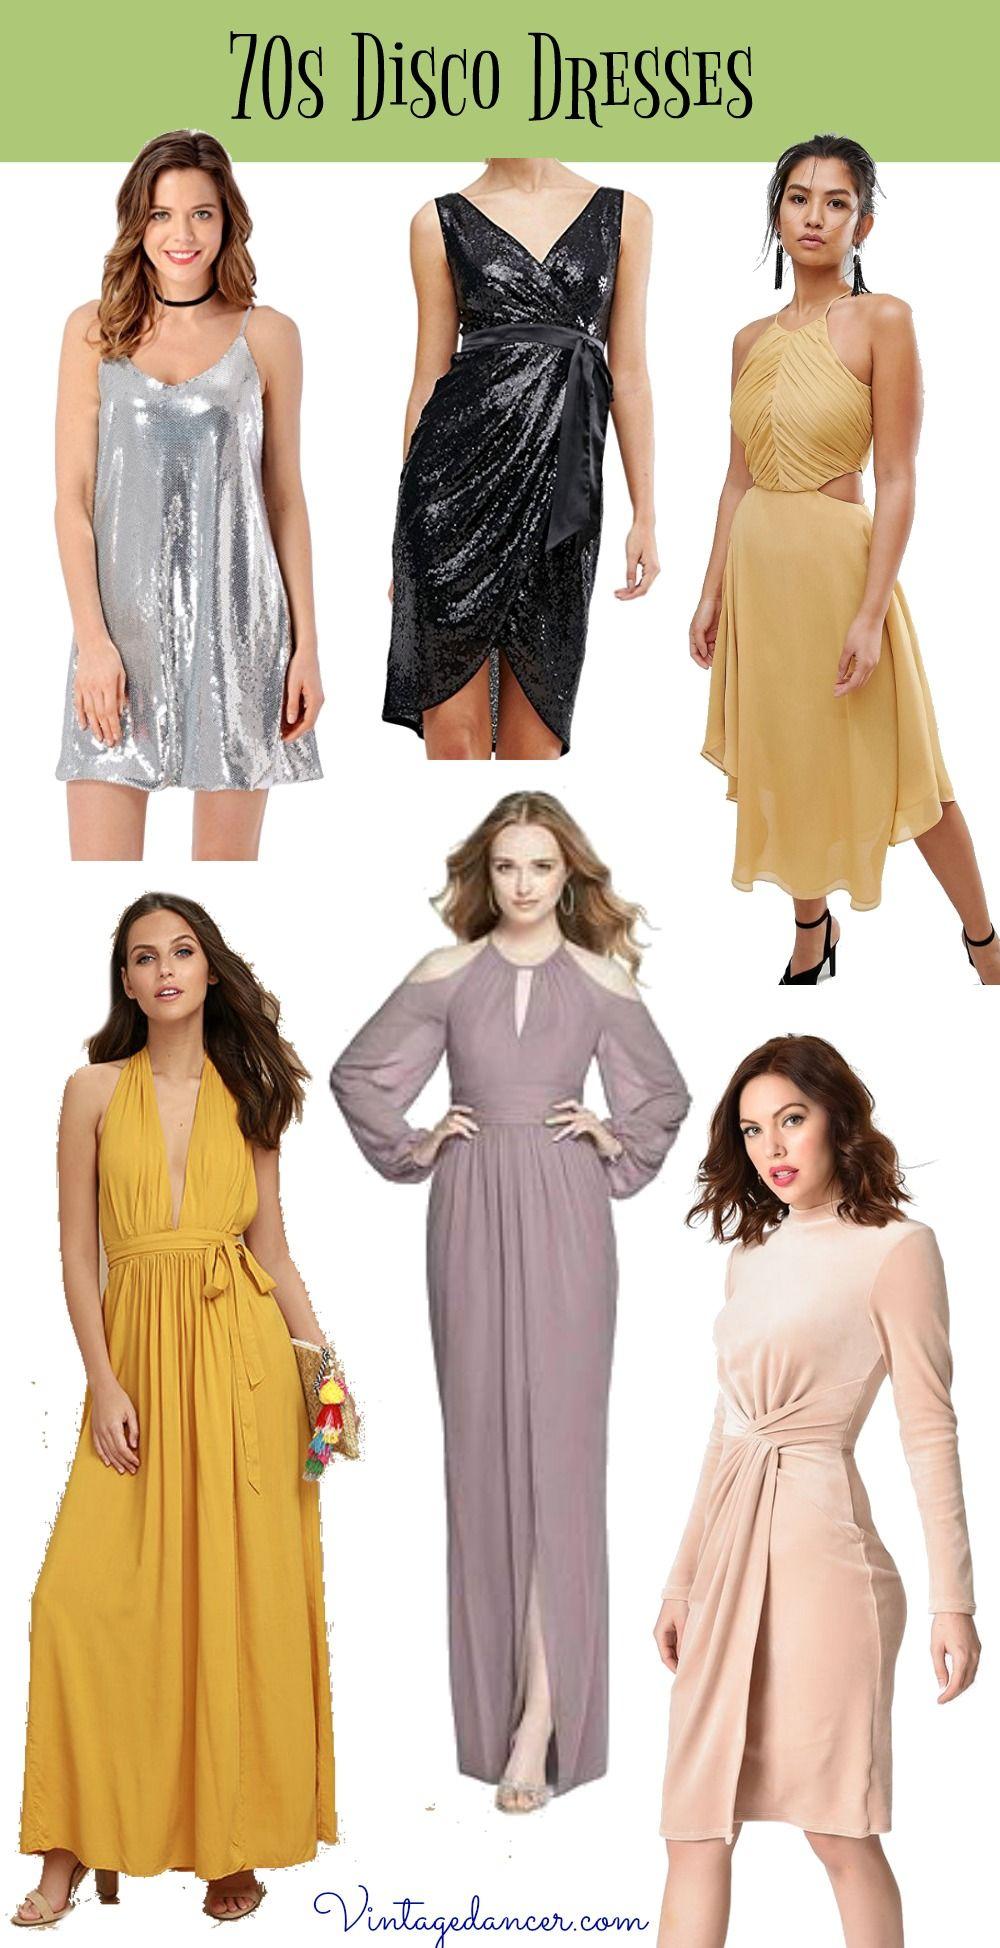 70s Disco Fashion Disco Clothes Outfits For Girls And Guys 70s Fashion Disco Disco Fashion Disco Outfit [ 1948 x 1000 Pixel ]